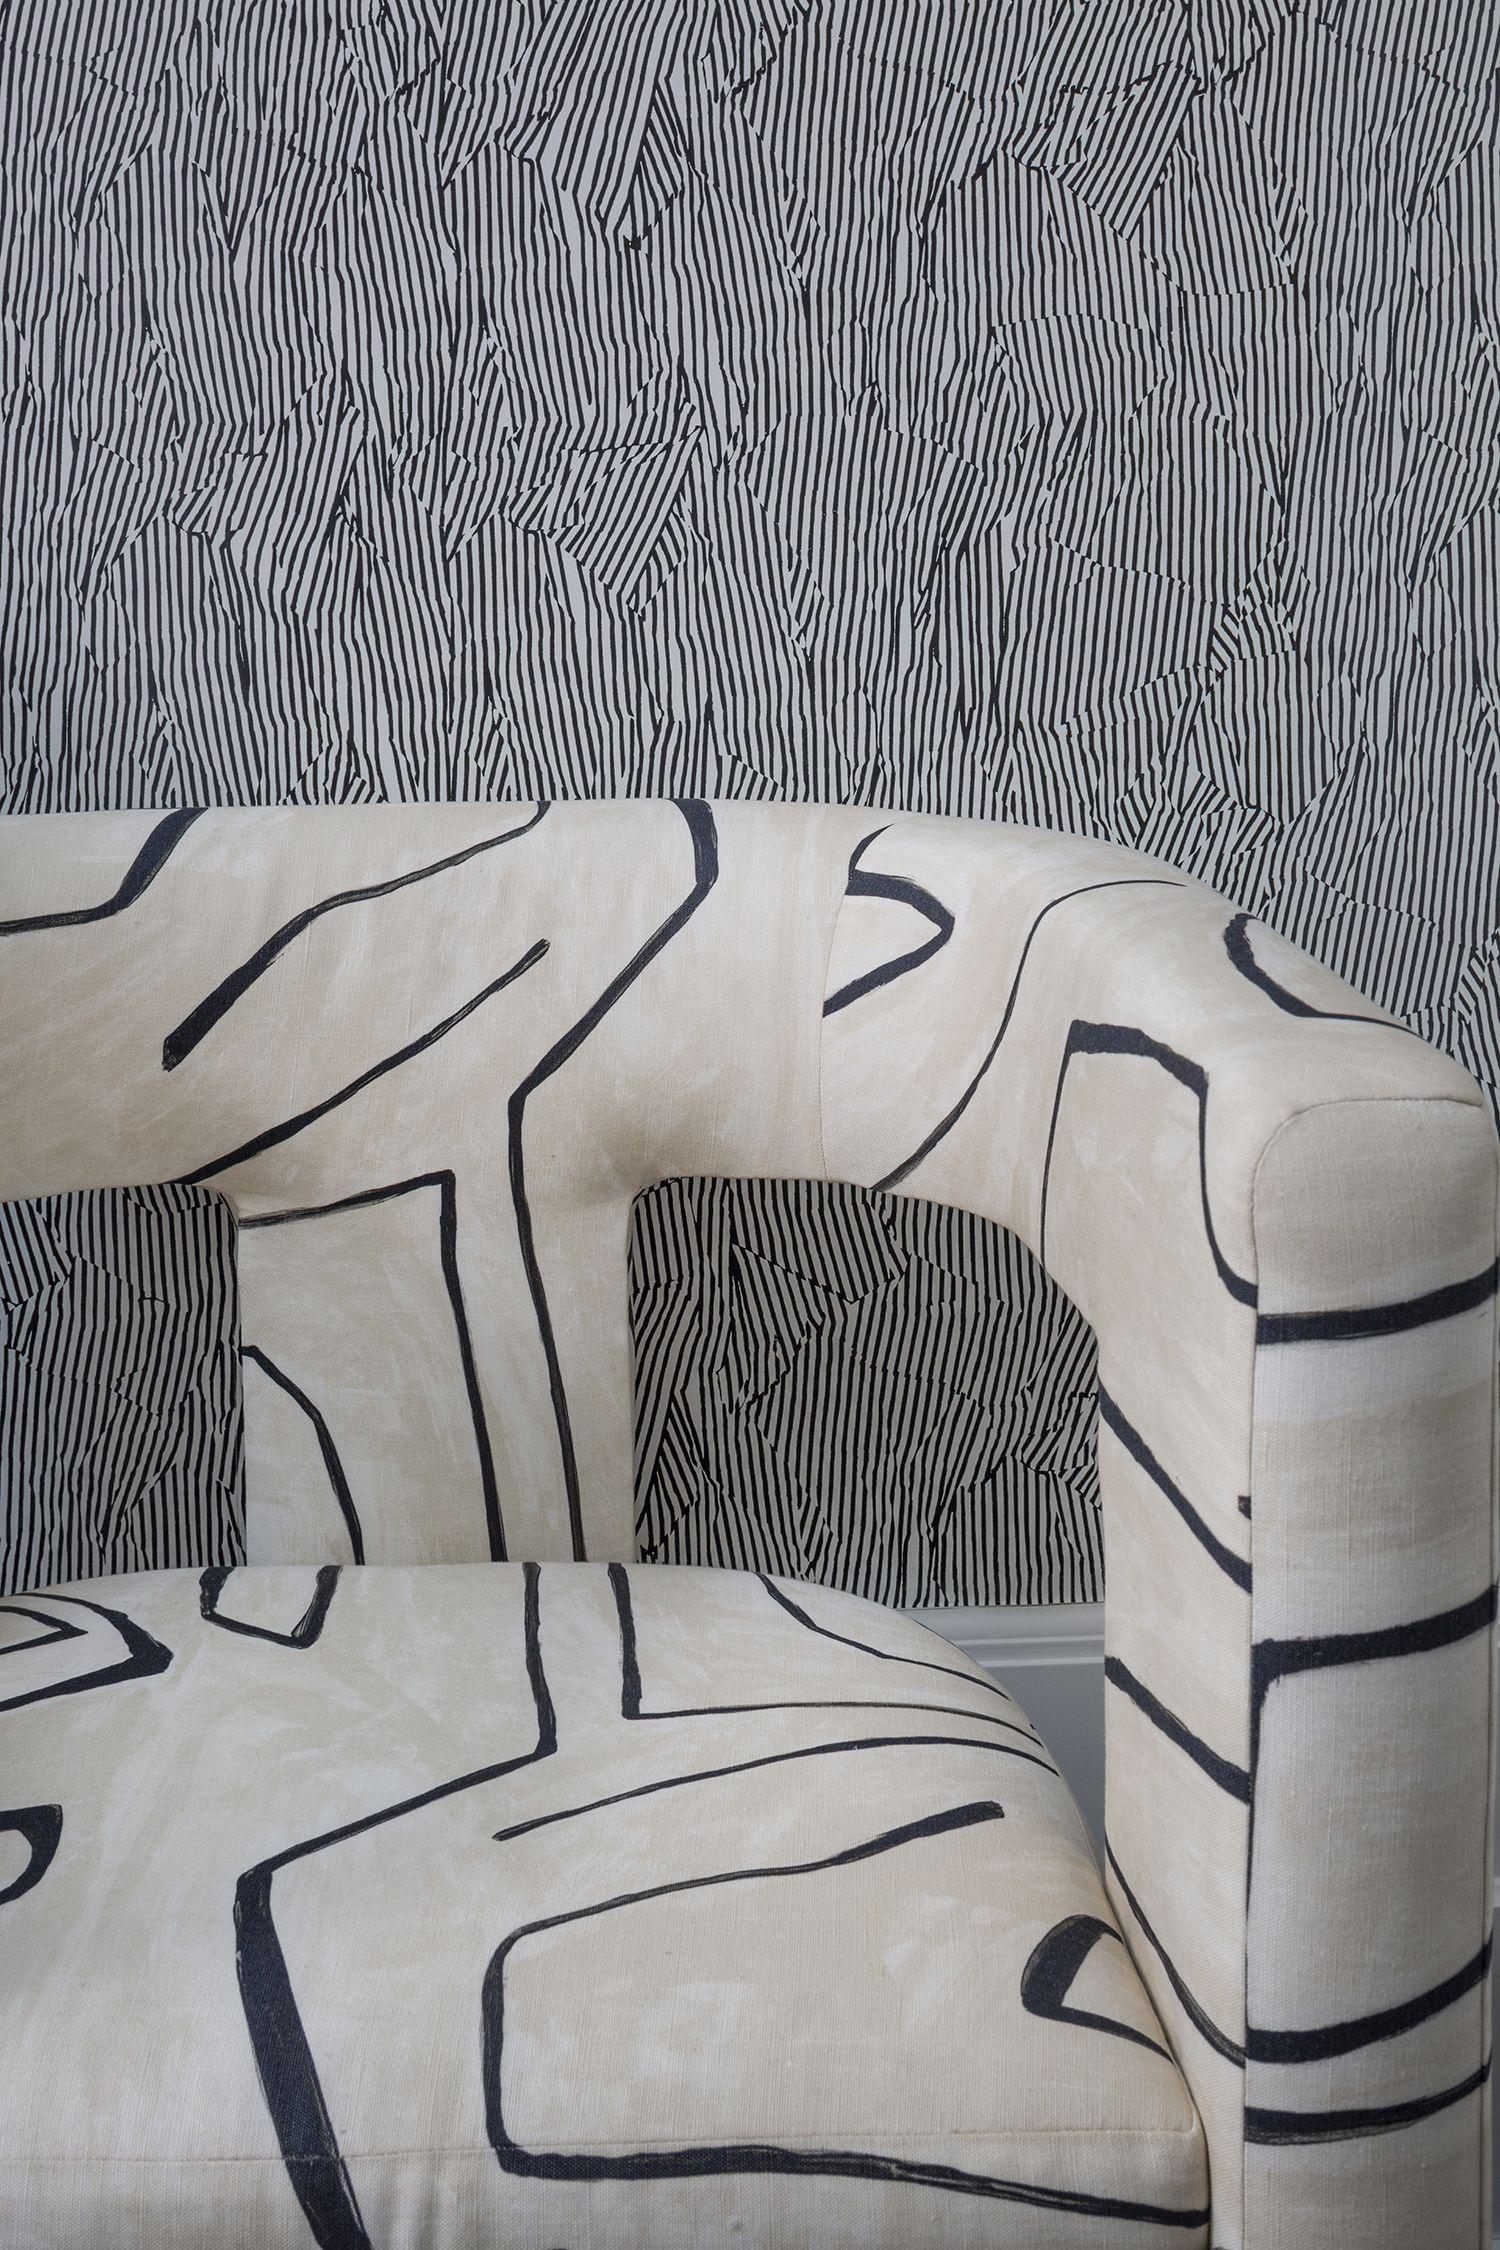 Graffito fabric Kelly wearstler wallpaper, Colorful